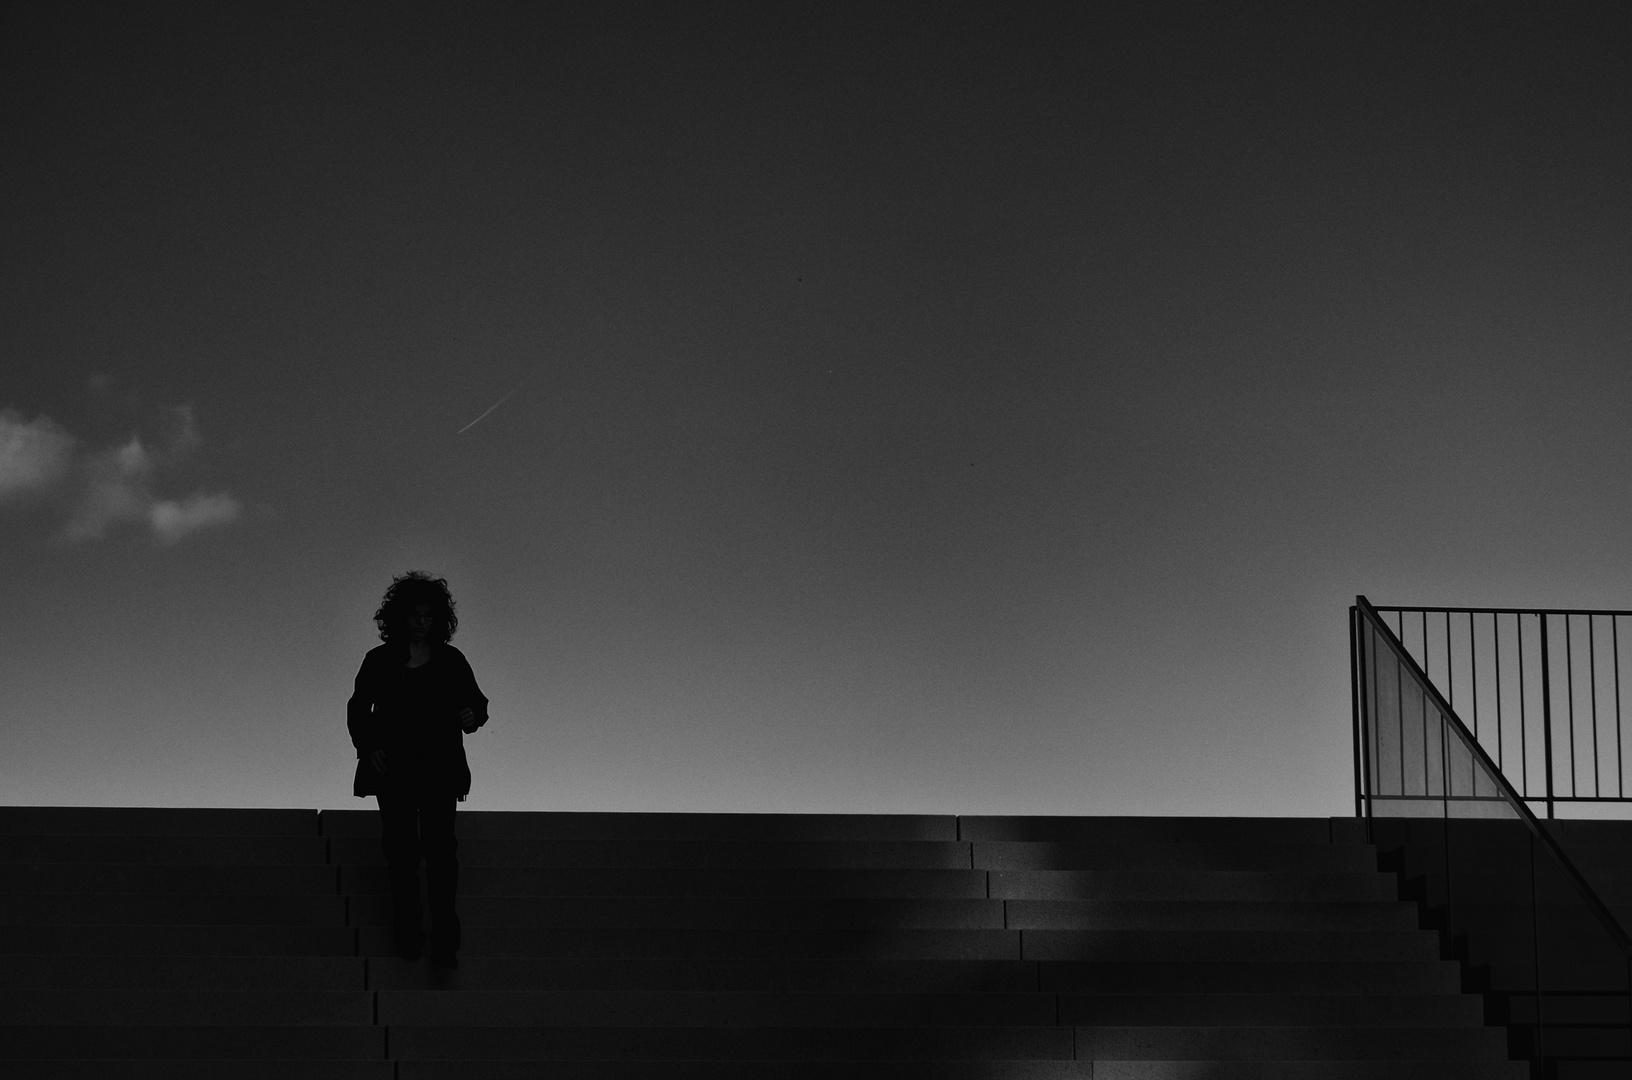 Urban loneliness VIII